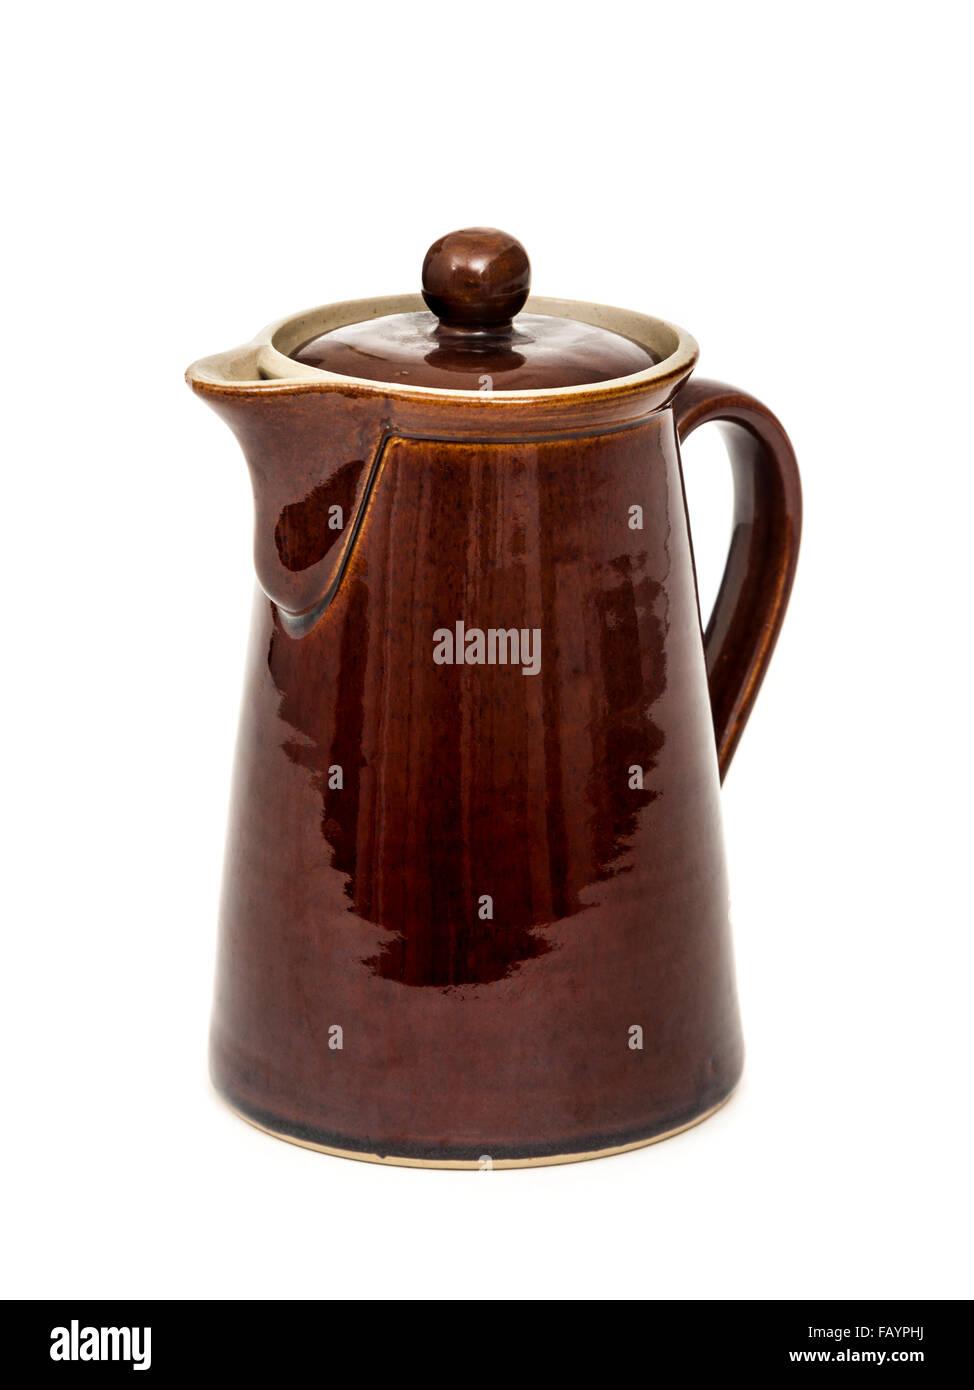 Denby Pottery (Bourne) vintage 1950's brown stoneware glazed 2pt lidded coffee pot - Stock Image